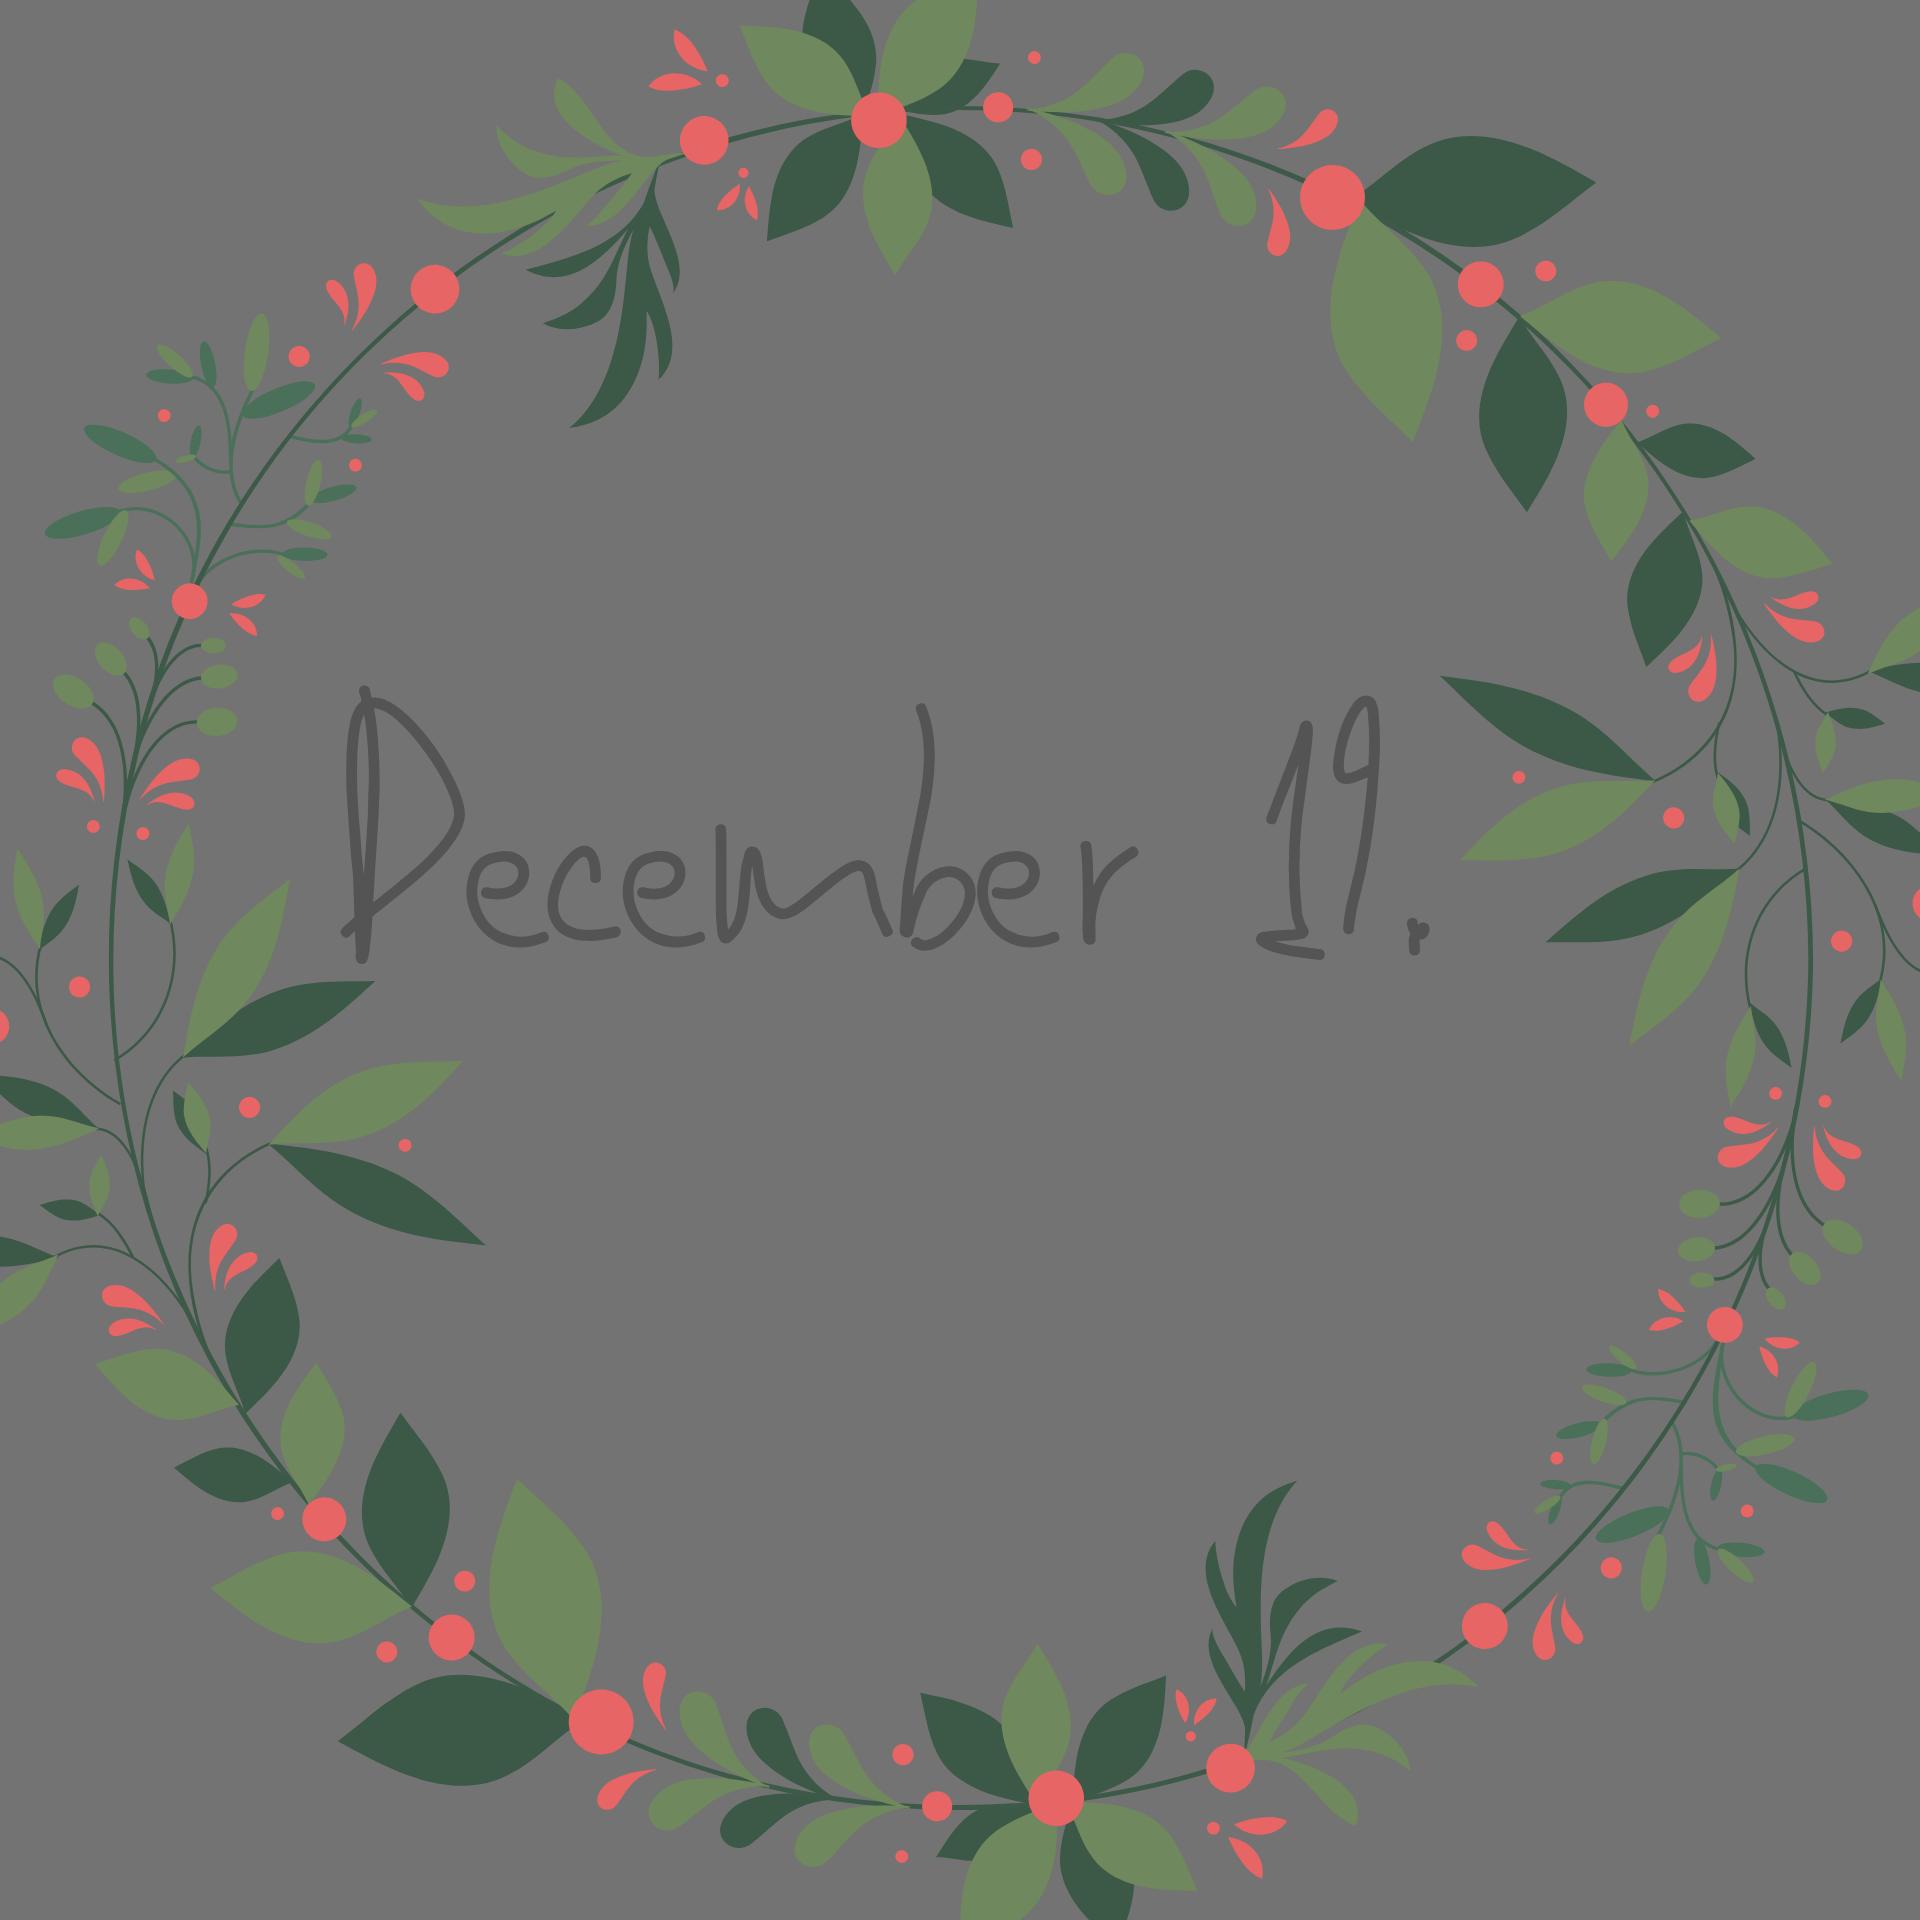 december_19_1.png